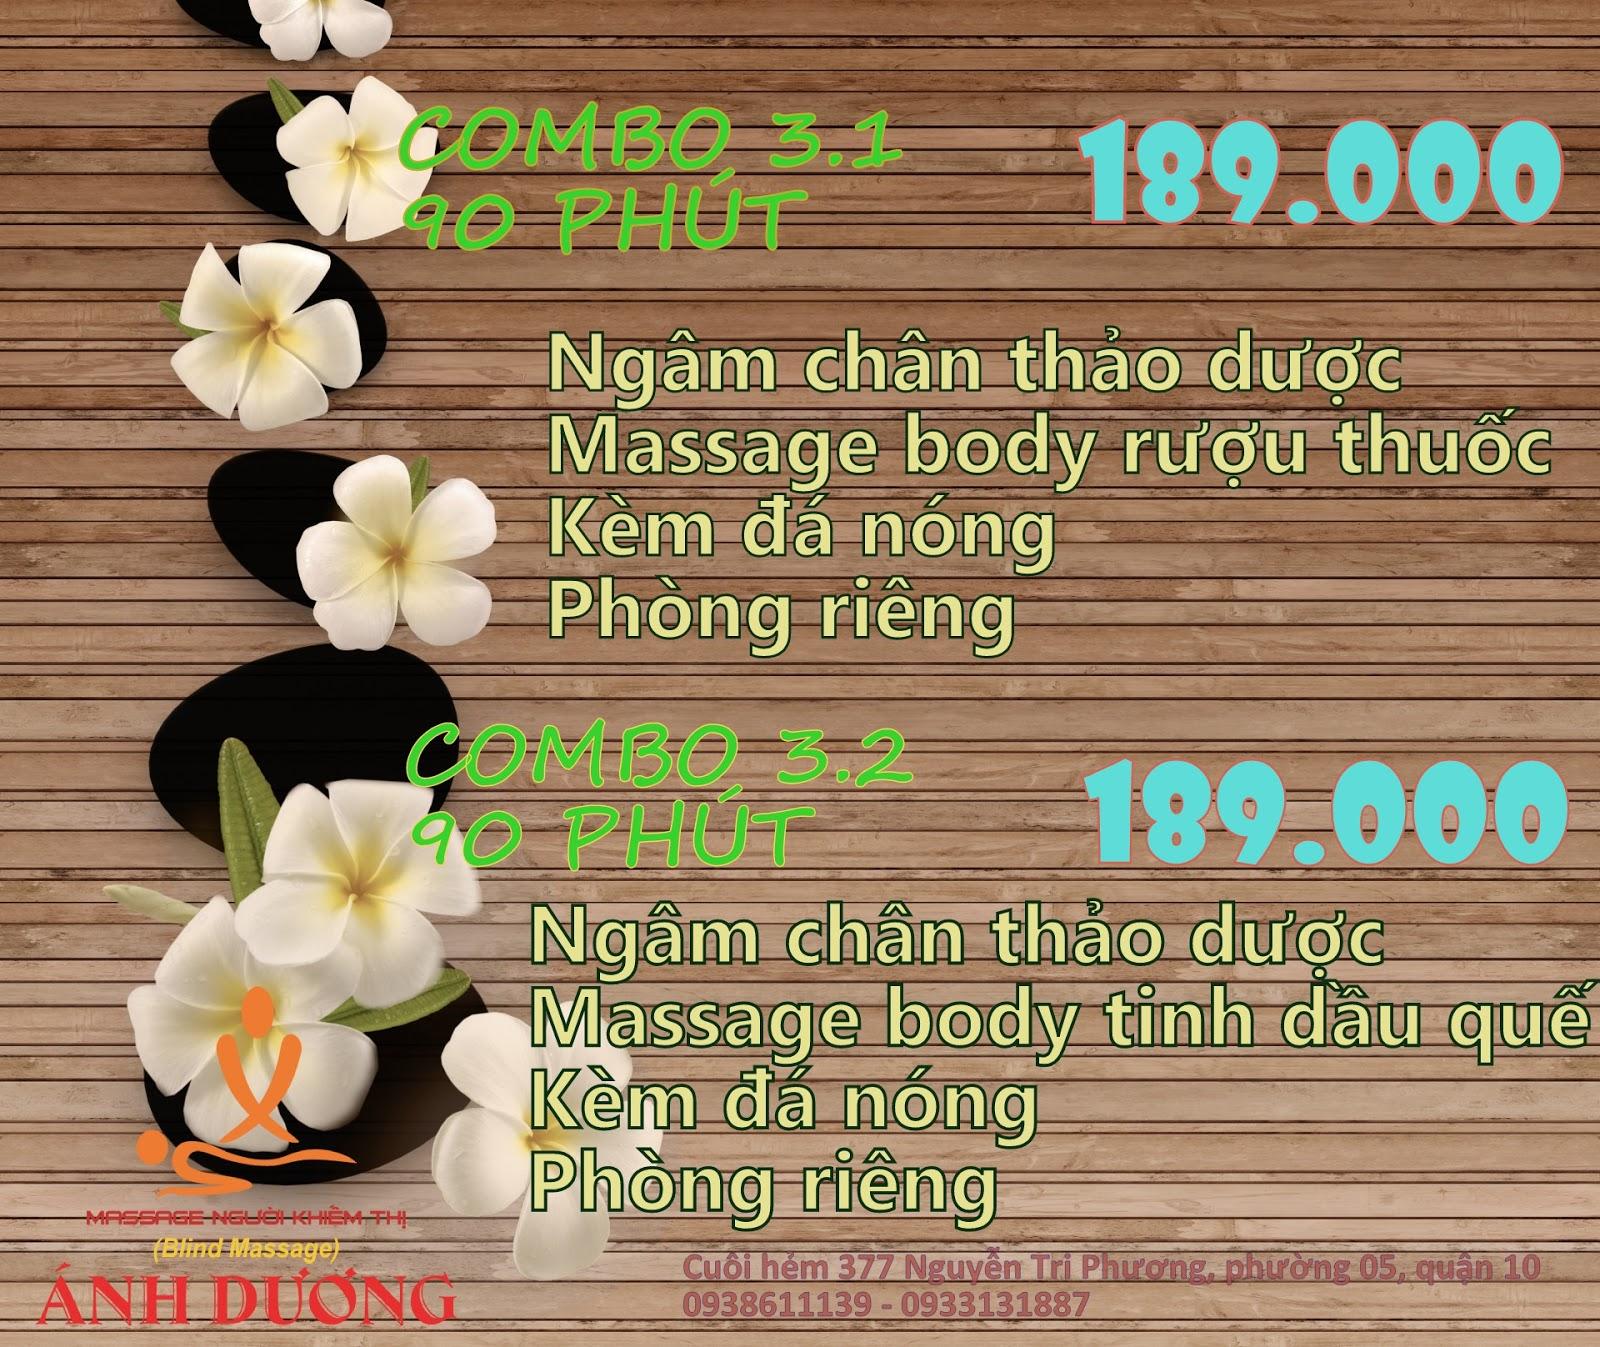 threads massage thanh xuan nguoi tinh thuong